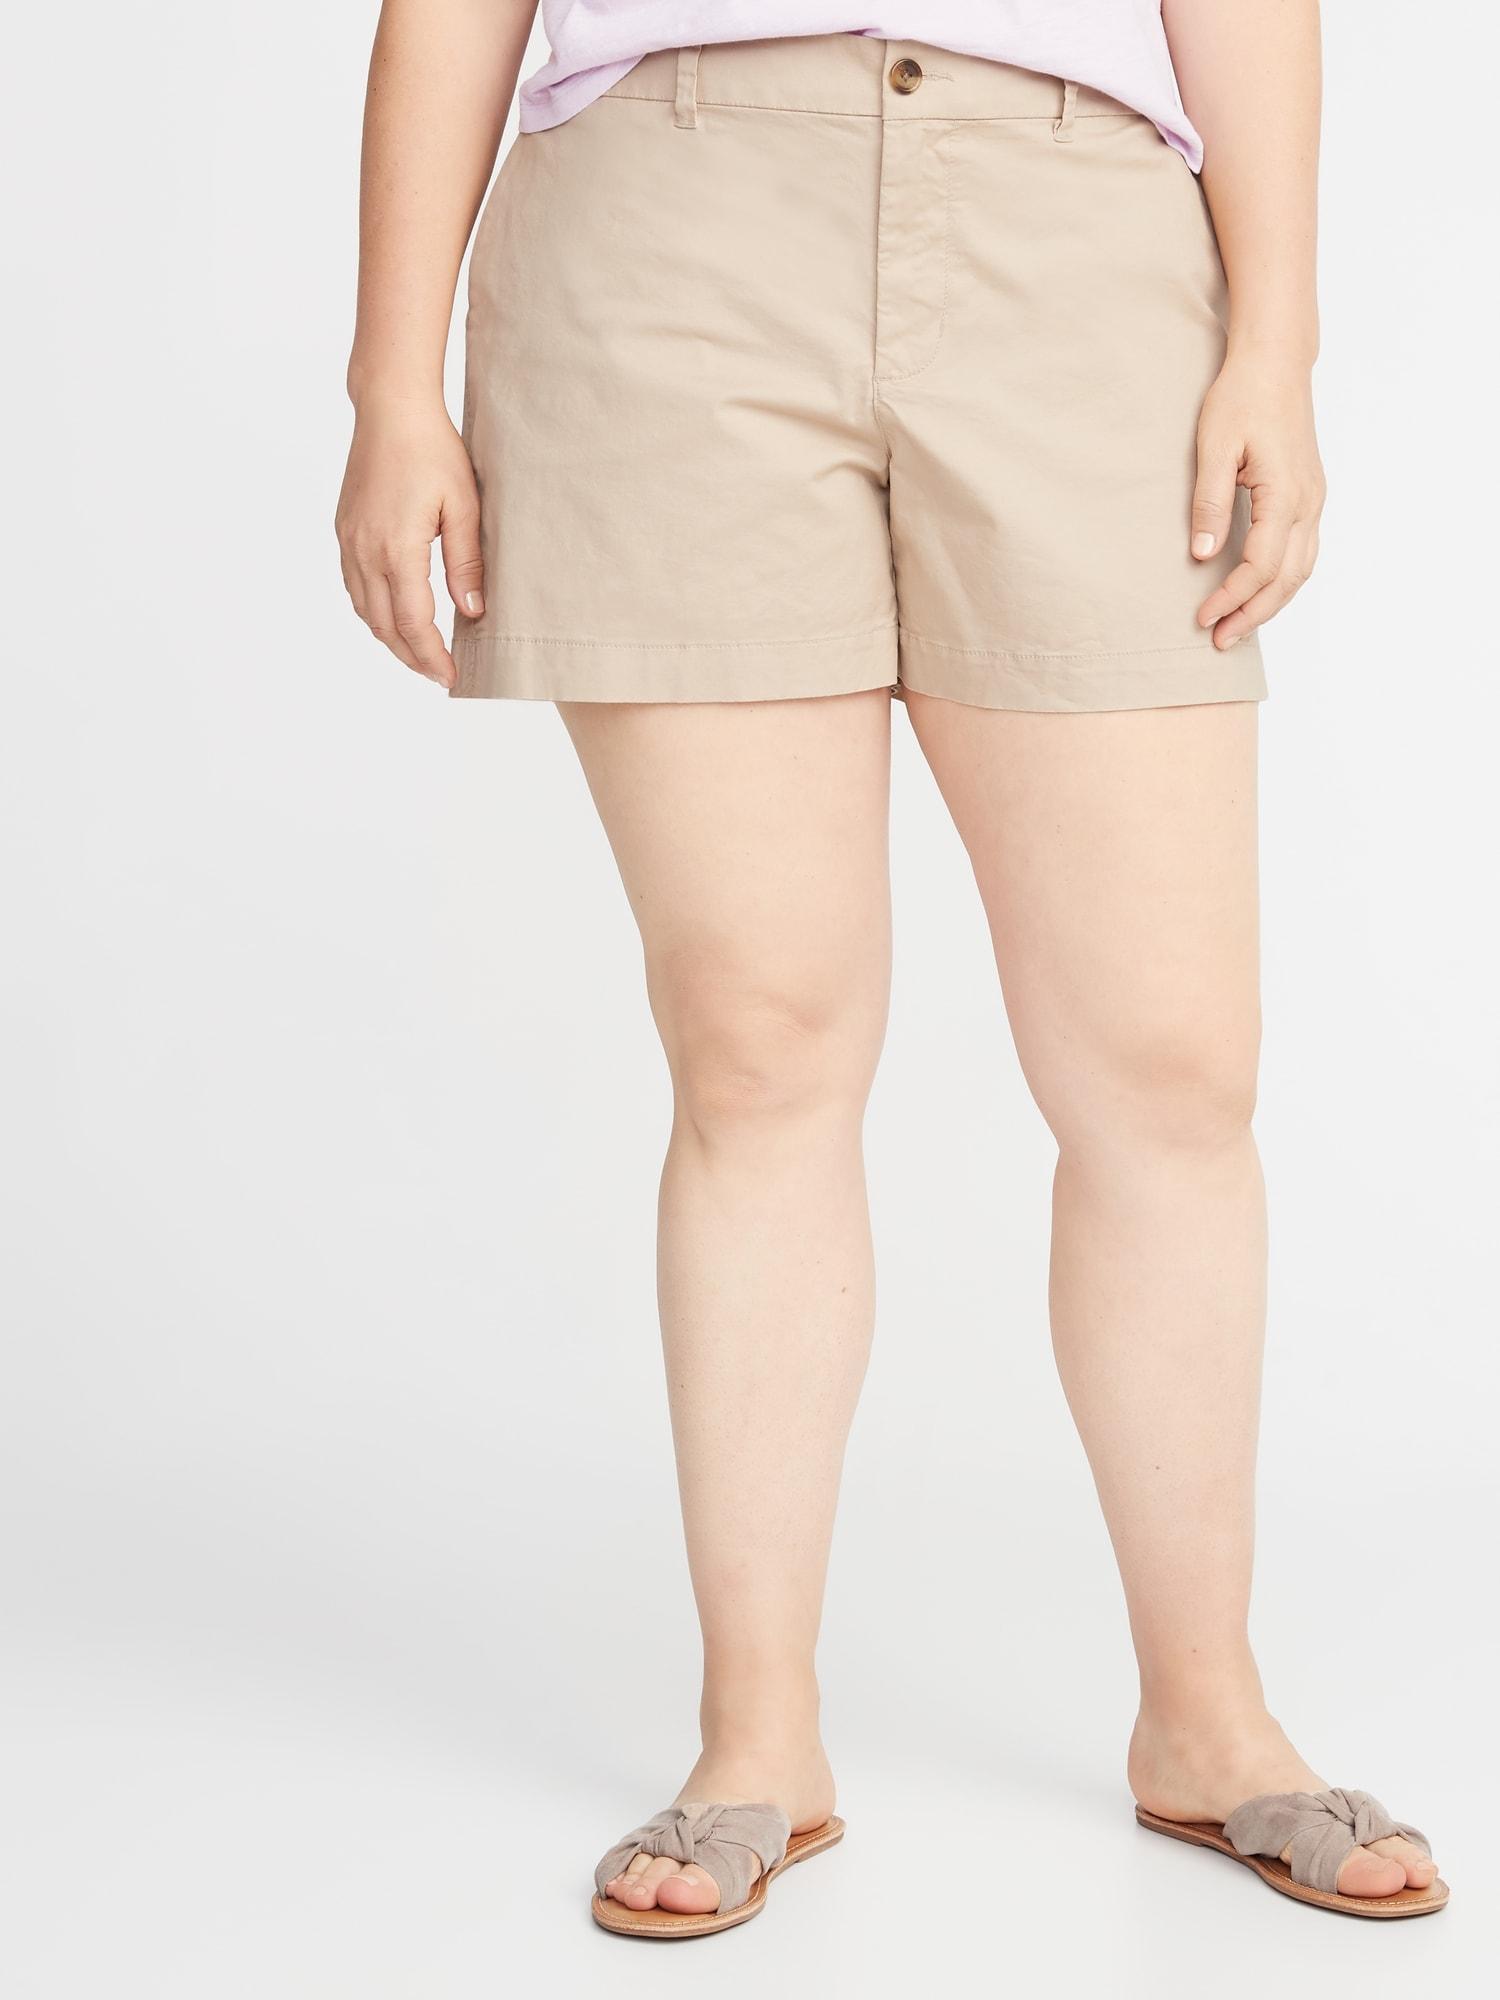 71b066cab70 Mid-Rise Plus-Size Everyday Twill Shorts - 5 Inch Inseam